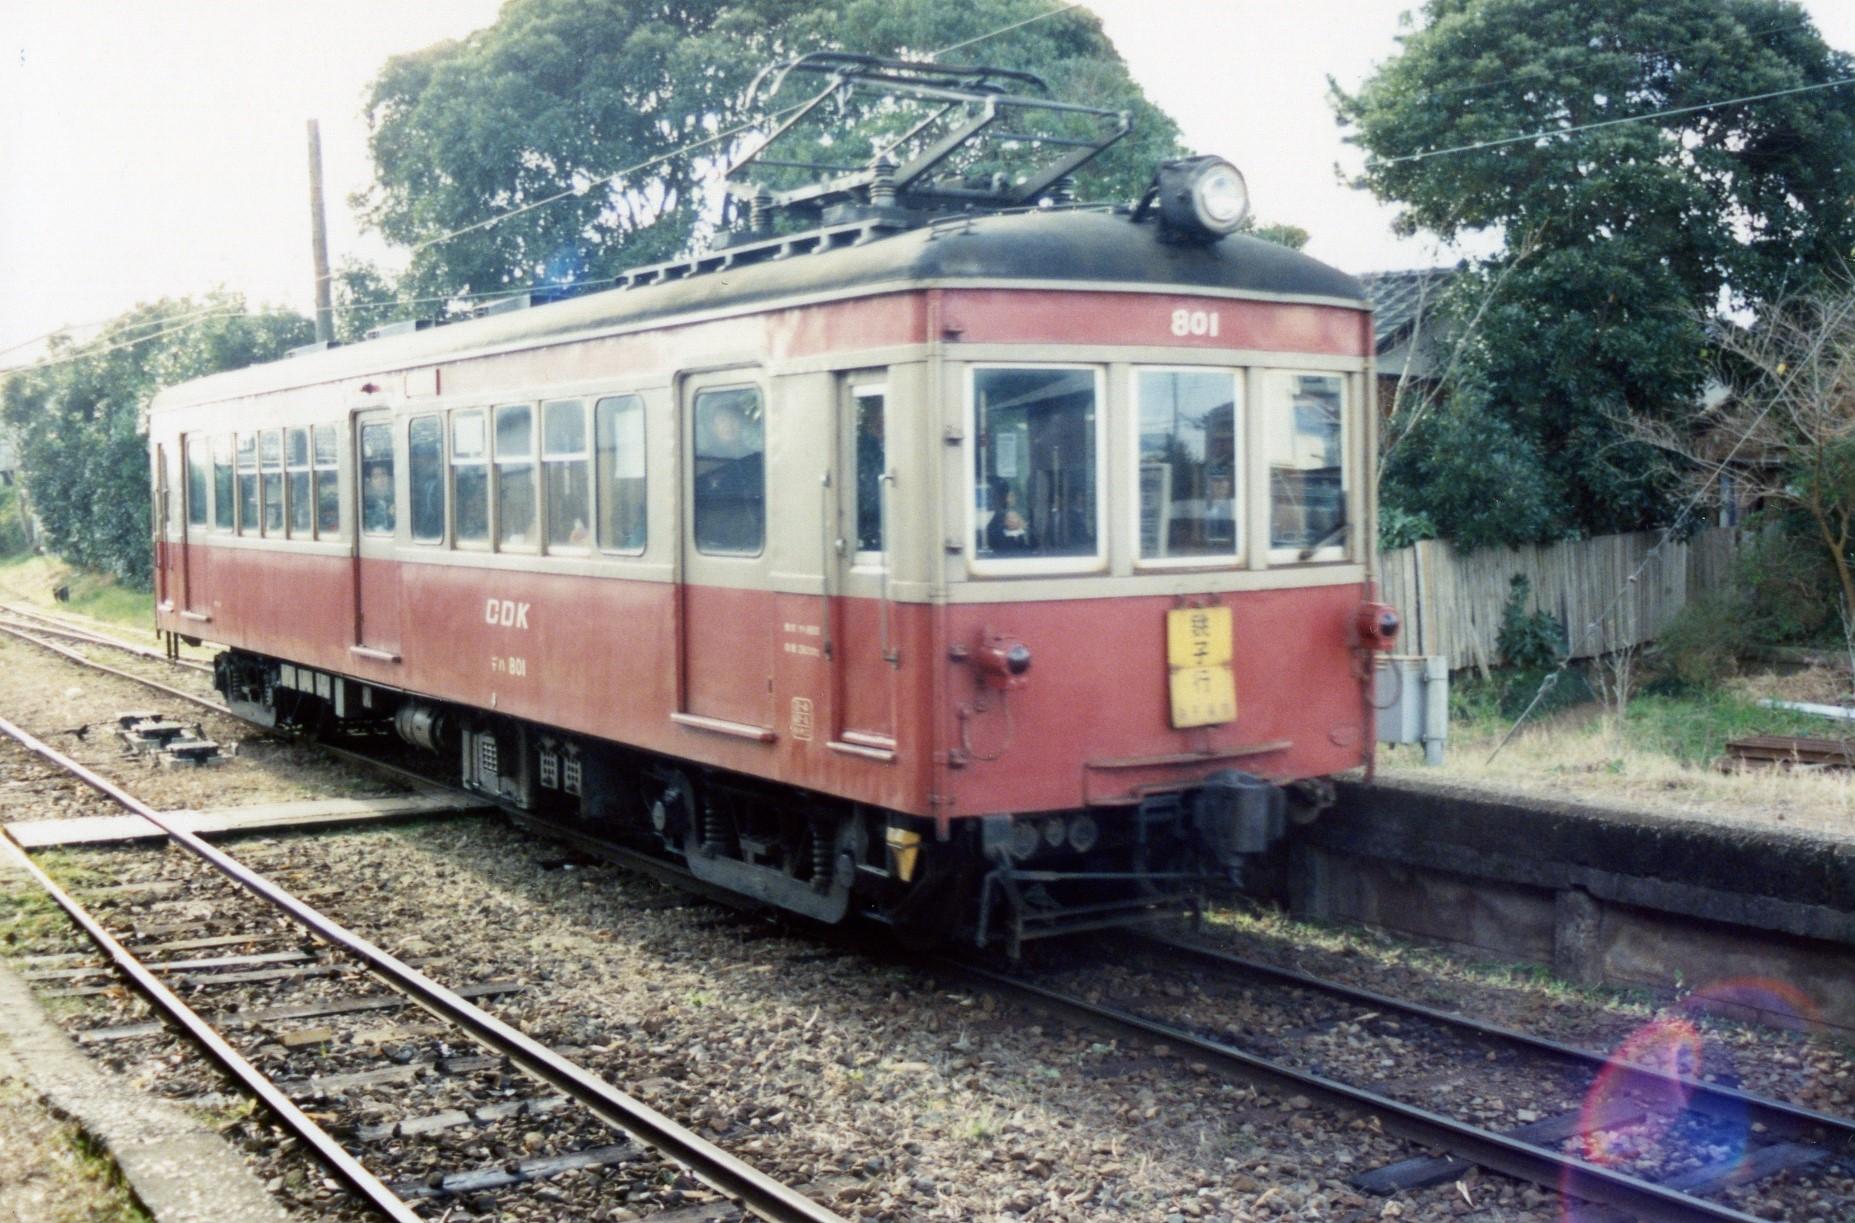 img291 (2)